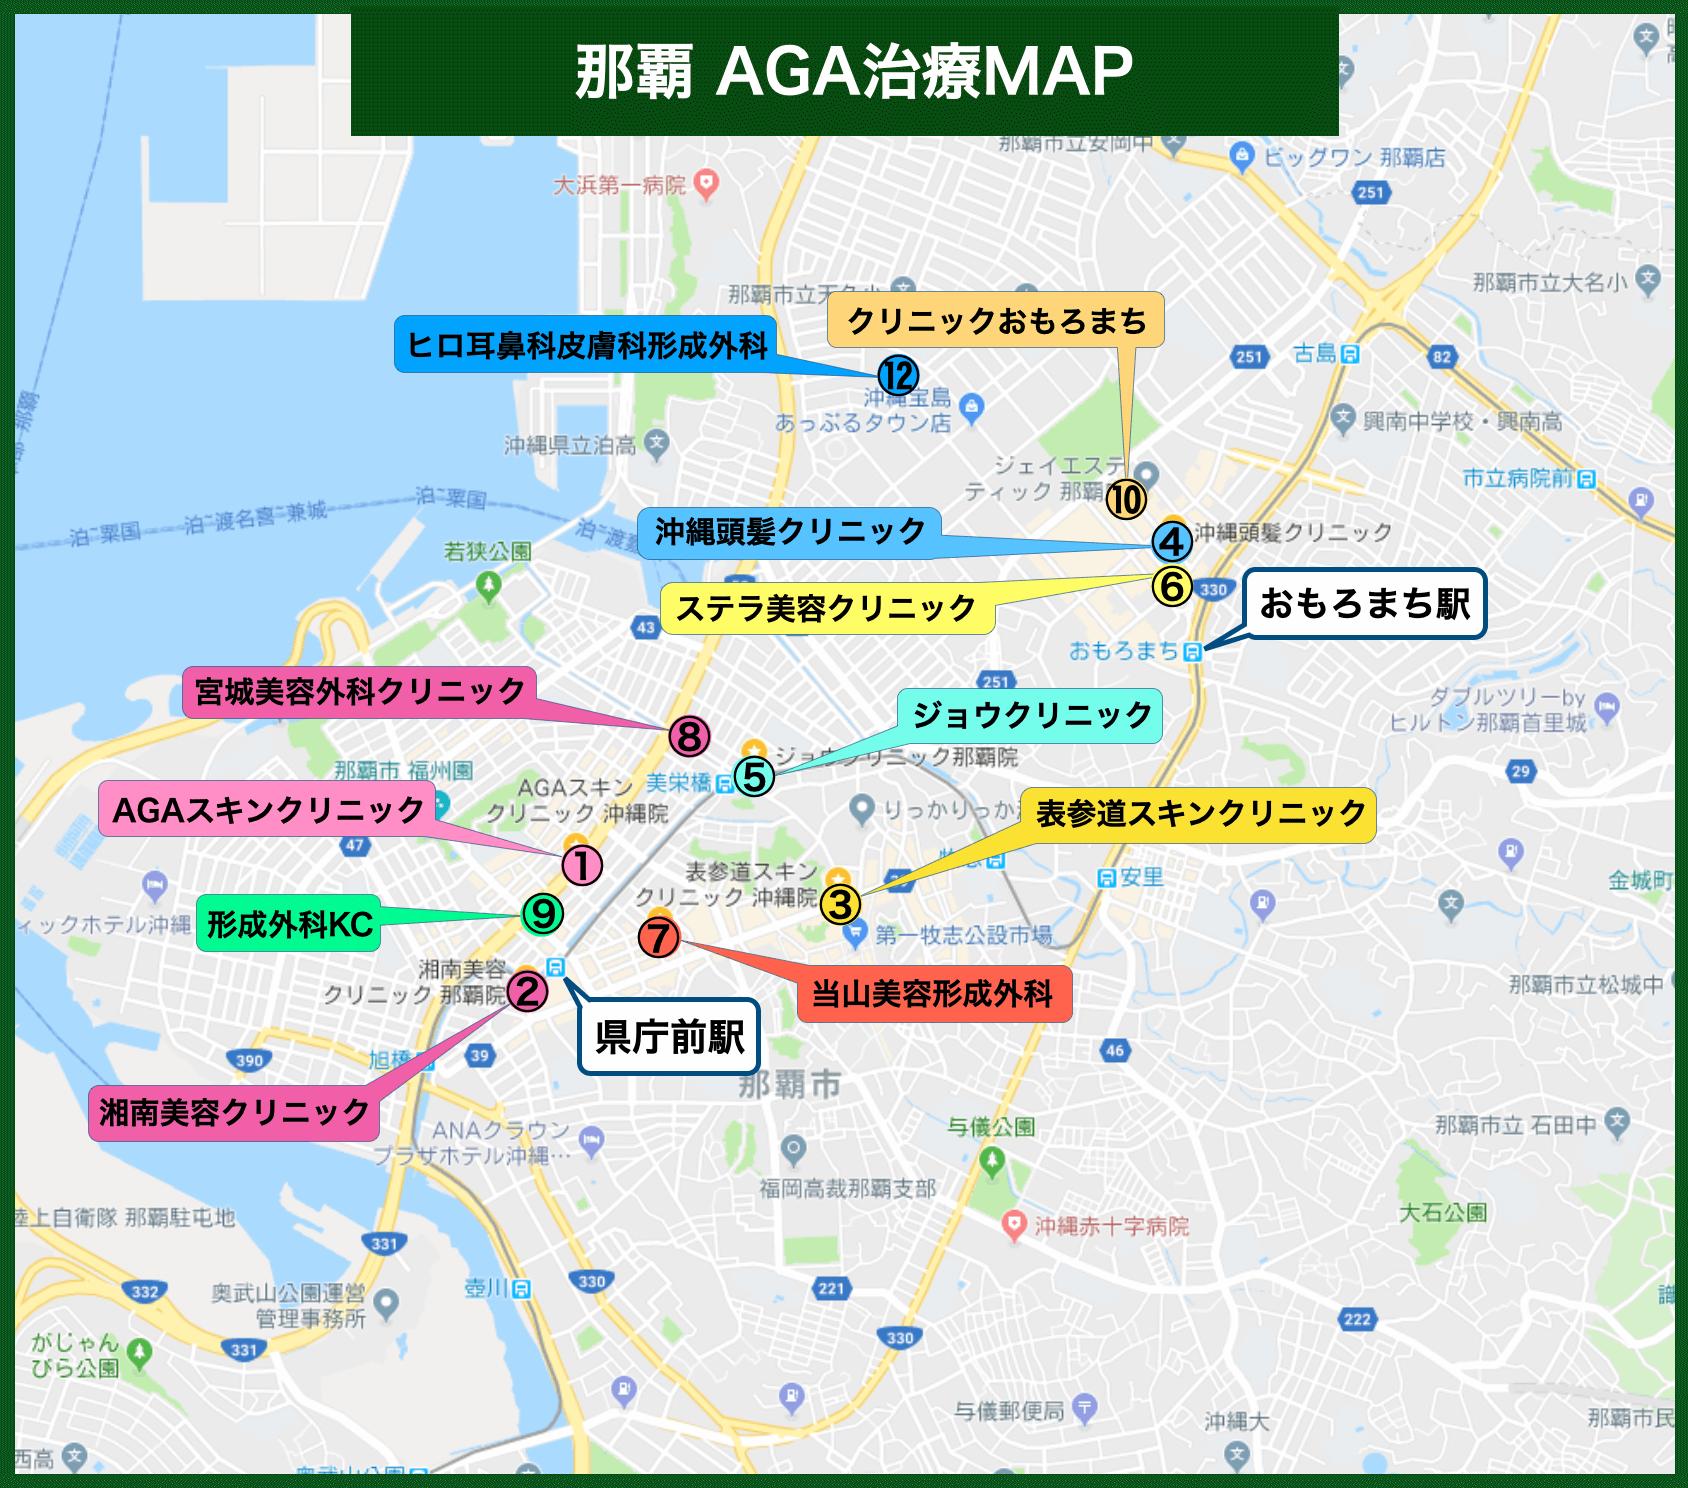 那覇 AGA治療MAP